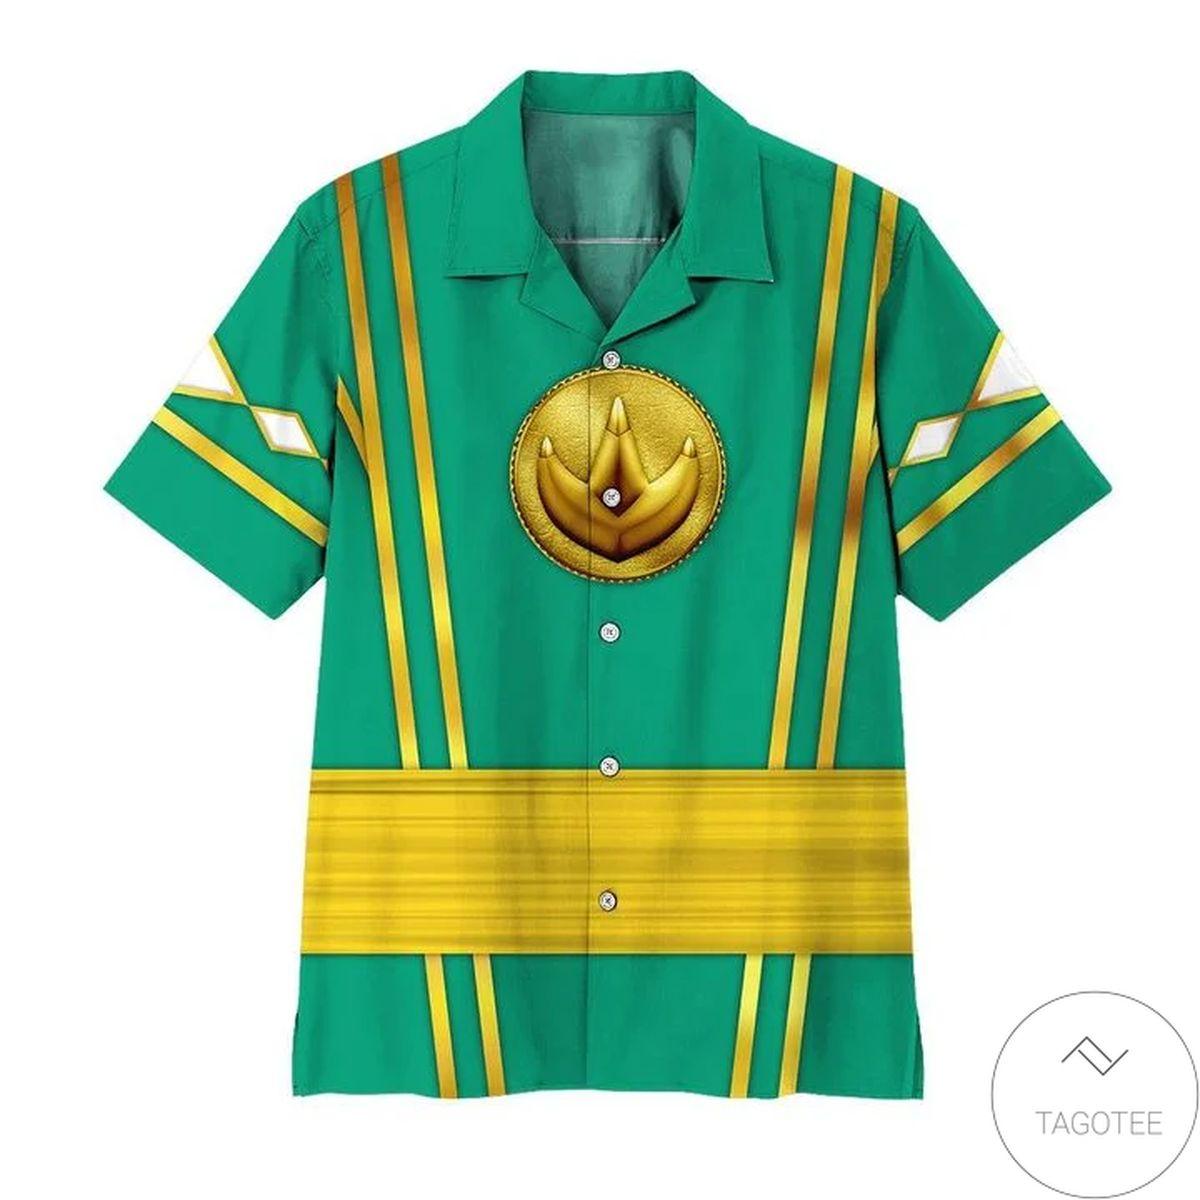 Mighty Morphin Power Rangers Ninja Rangers Green The Dragon Hawaiian Shirt